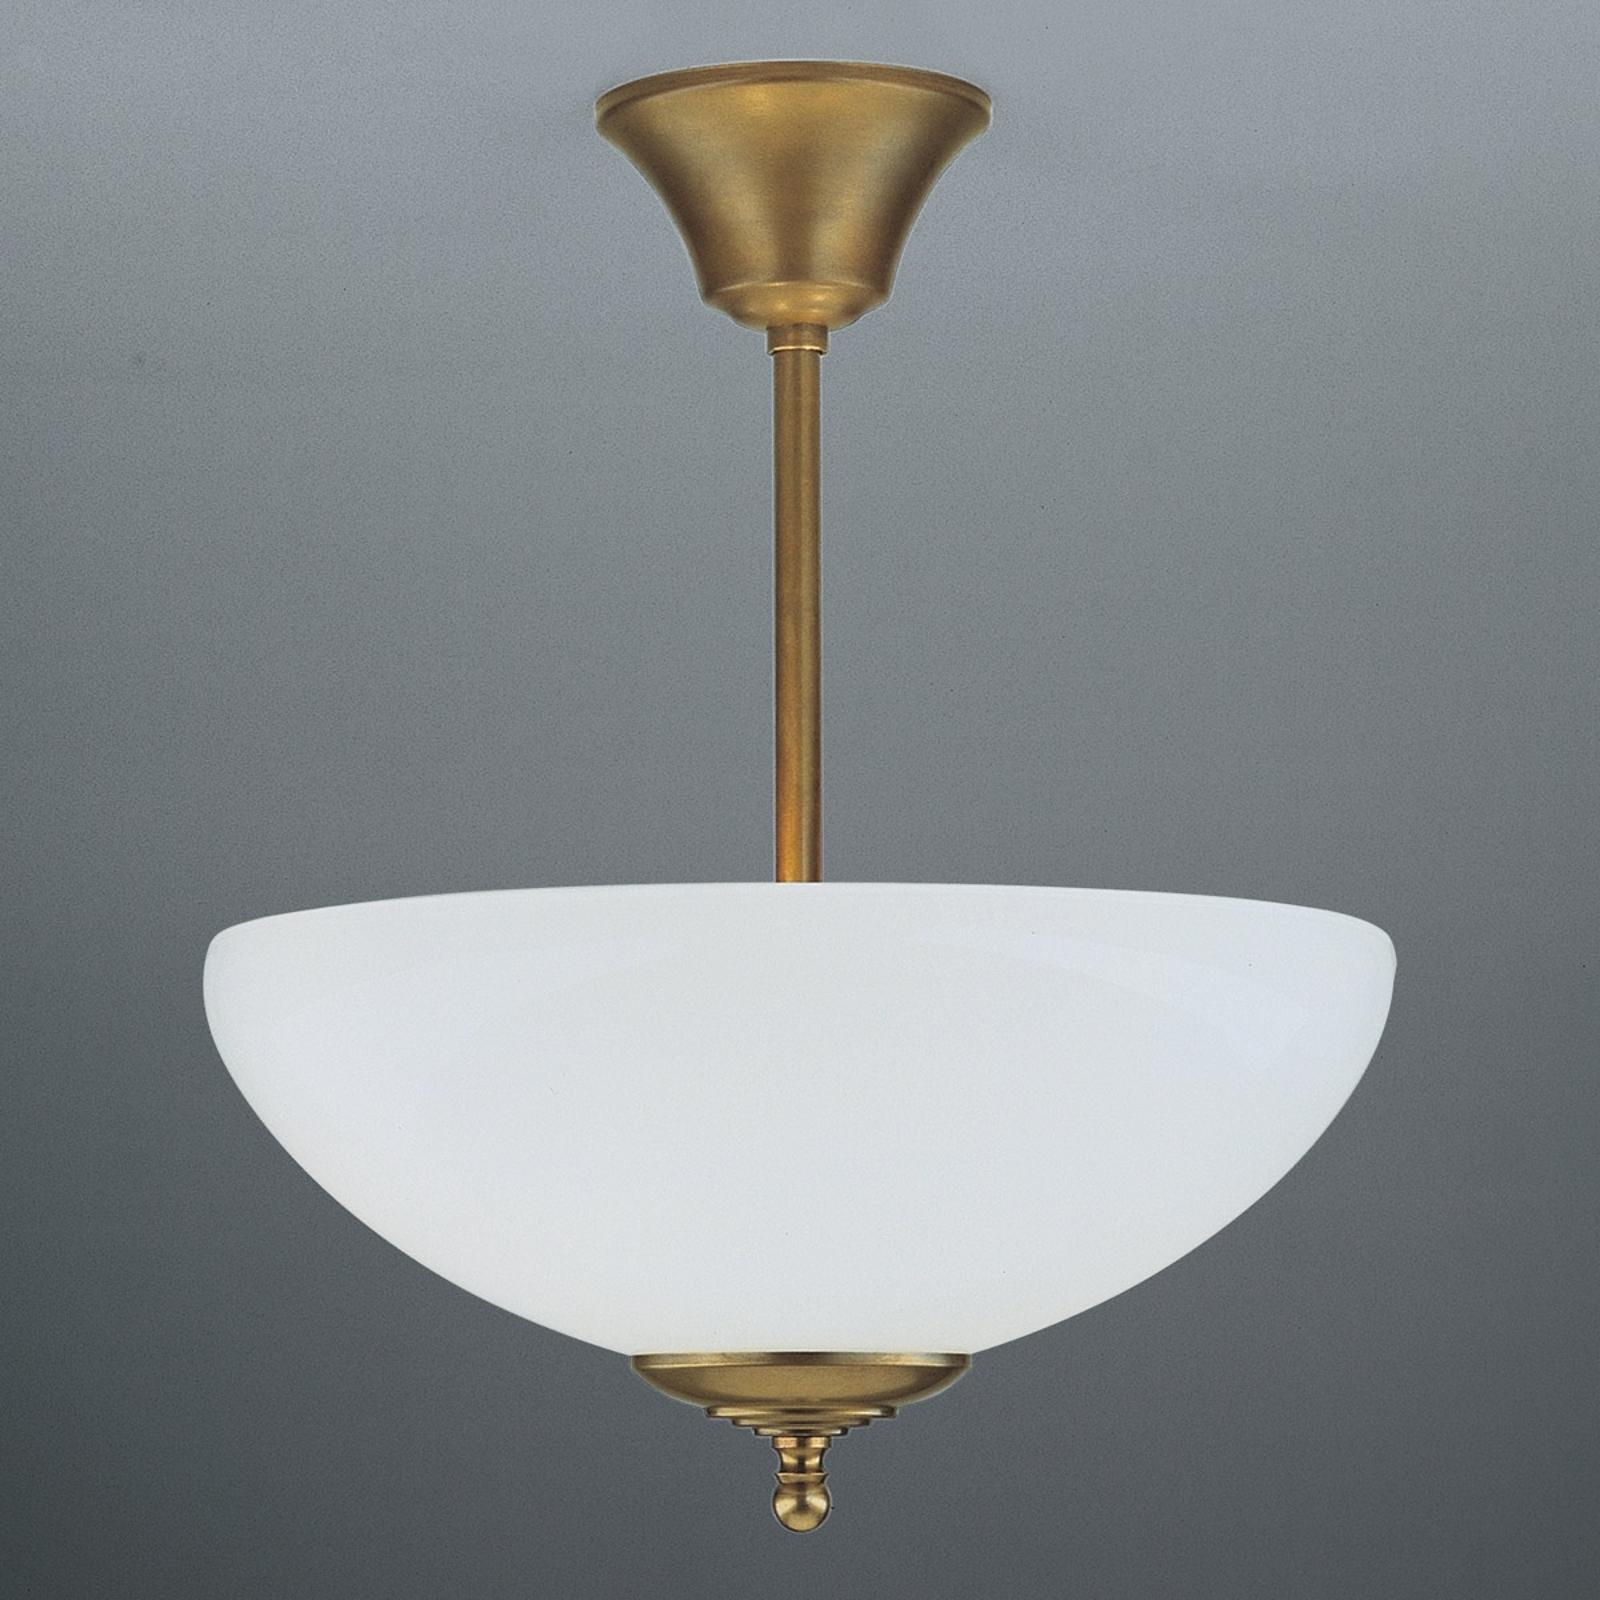 Handgemaakte plafondlamp ANNI, nikkel